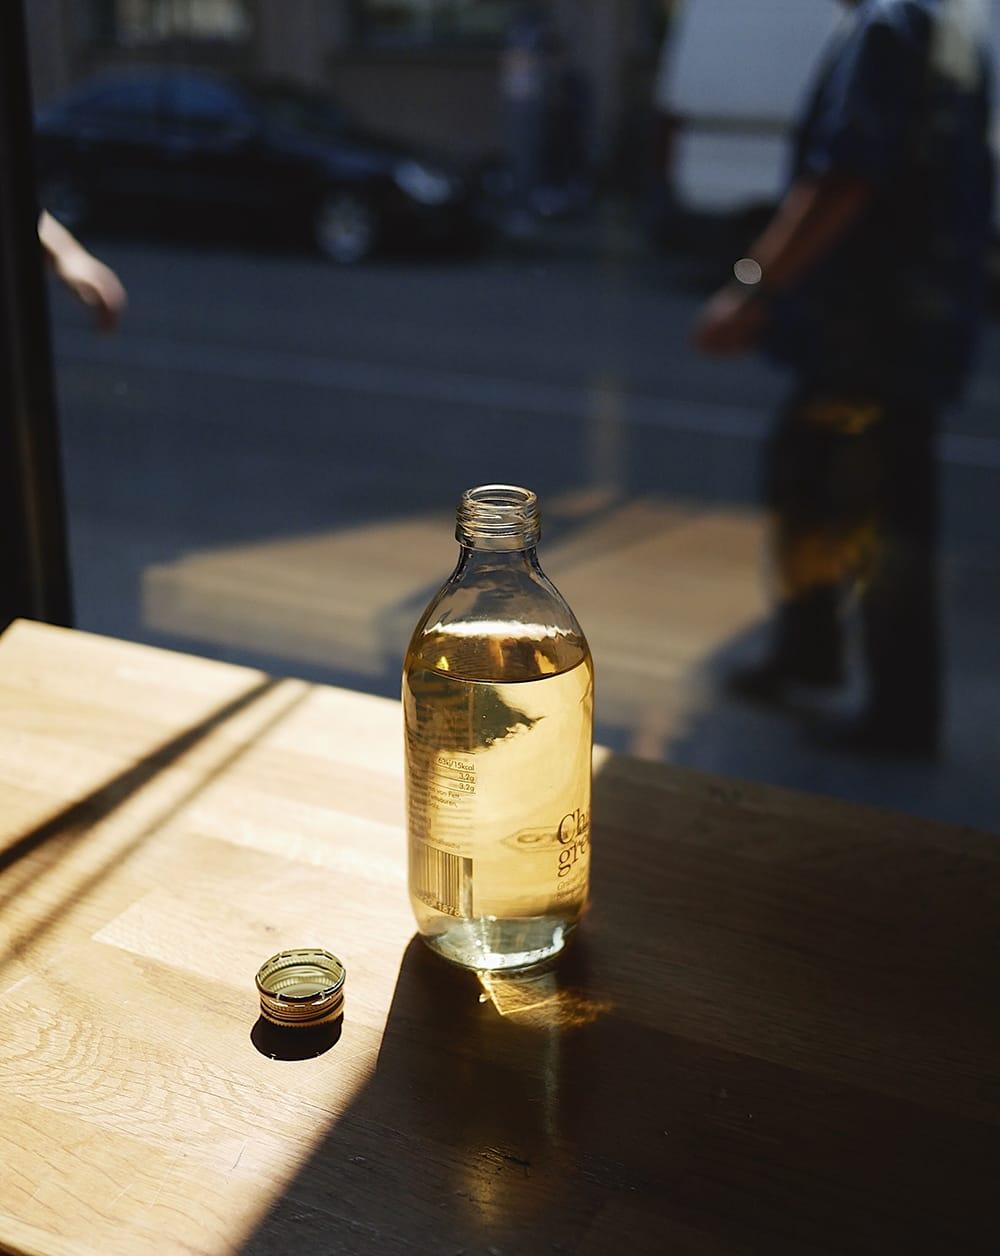 A bottle of tea brew on a table by the street. Berlin